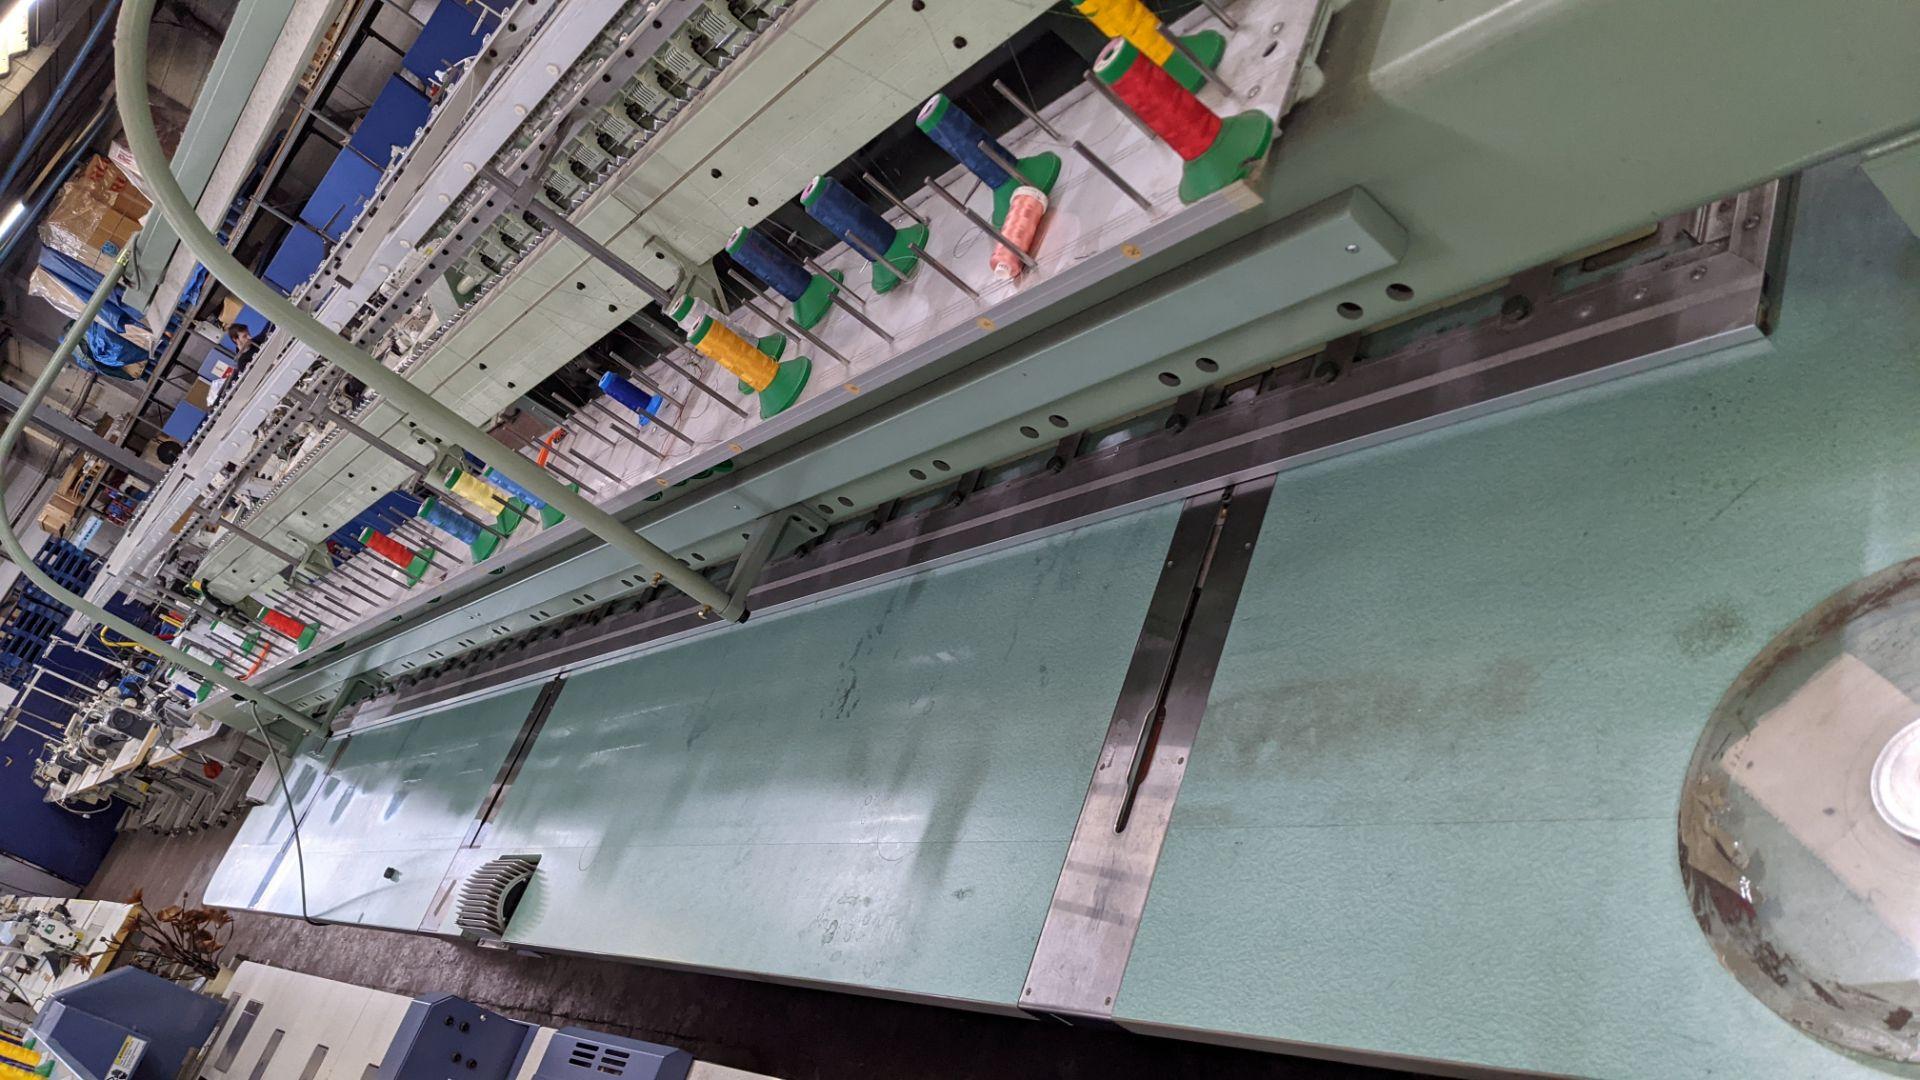 Tokai Tajima electronic 20 head automatic embroidery machine model TMEF-H620 - Image 20 of 25